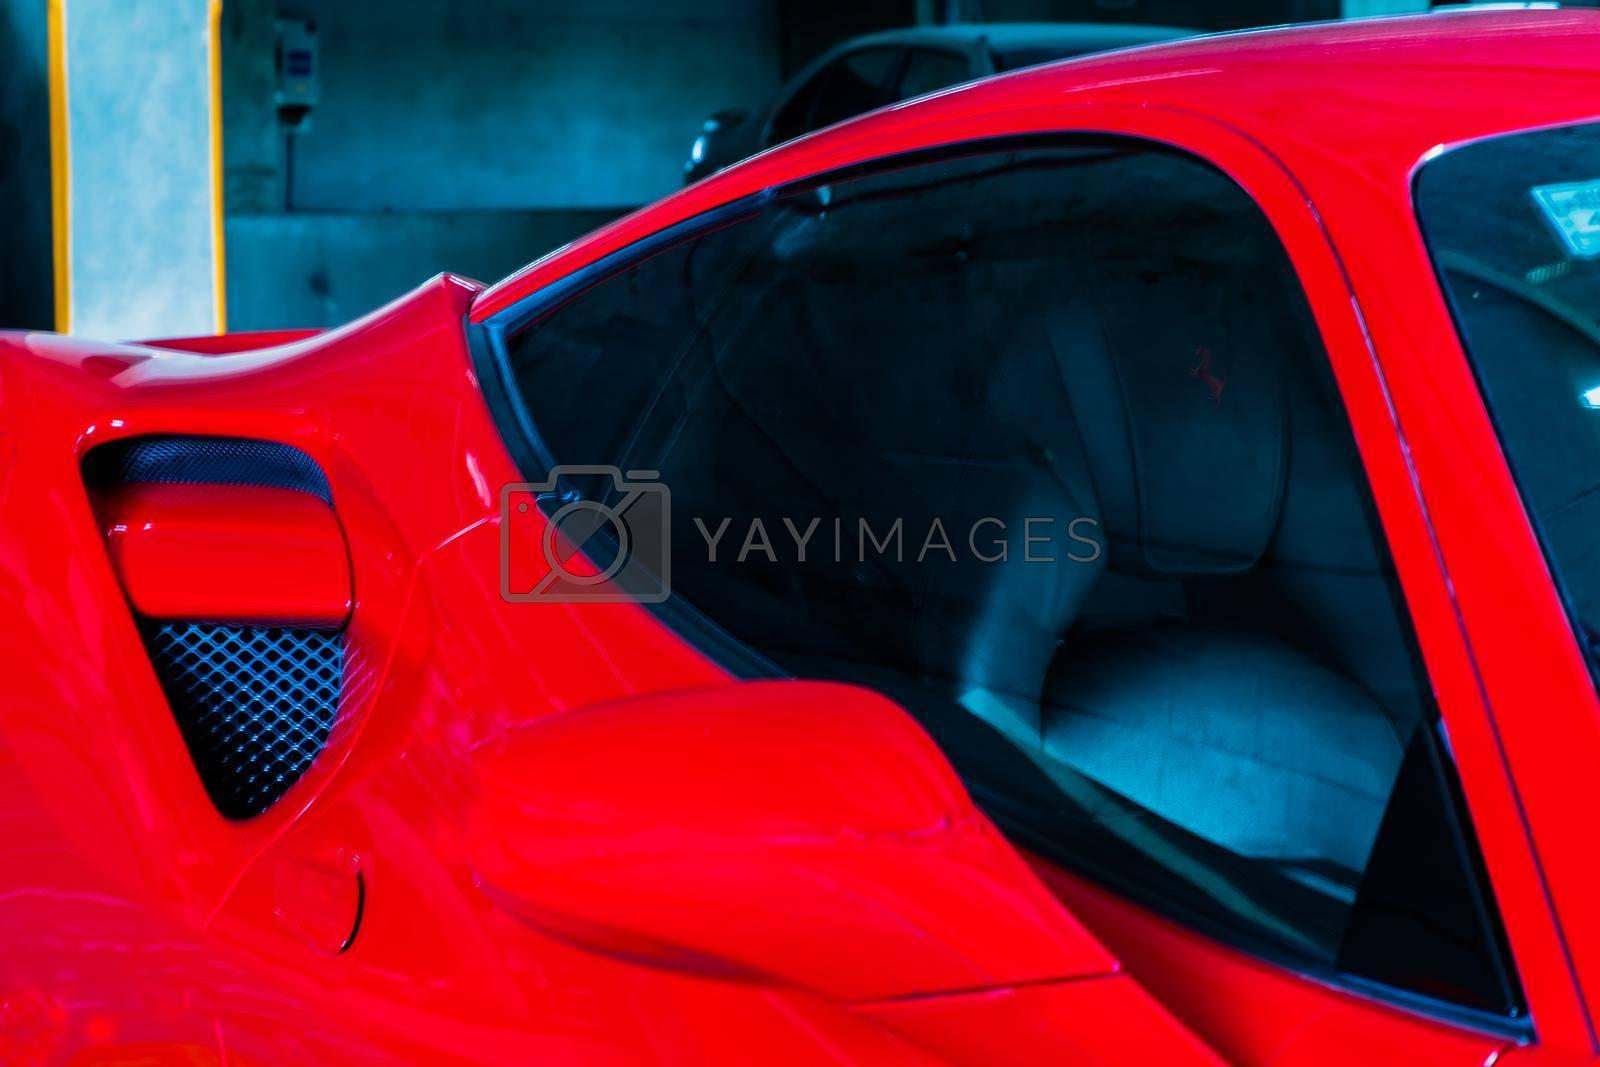 Bangkok, Thailand - 06 Jun 2021 : Close-up of Side Mirror and Car window of Red ferrari car. Ferrari is Italian sports car. Selective focus.